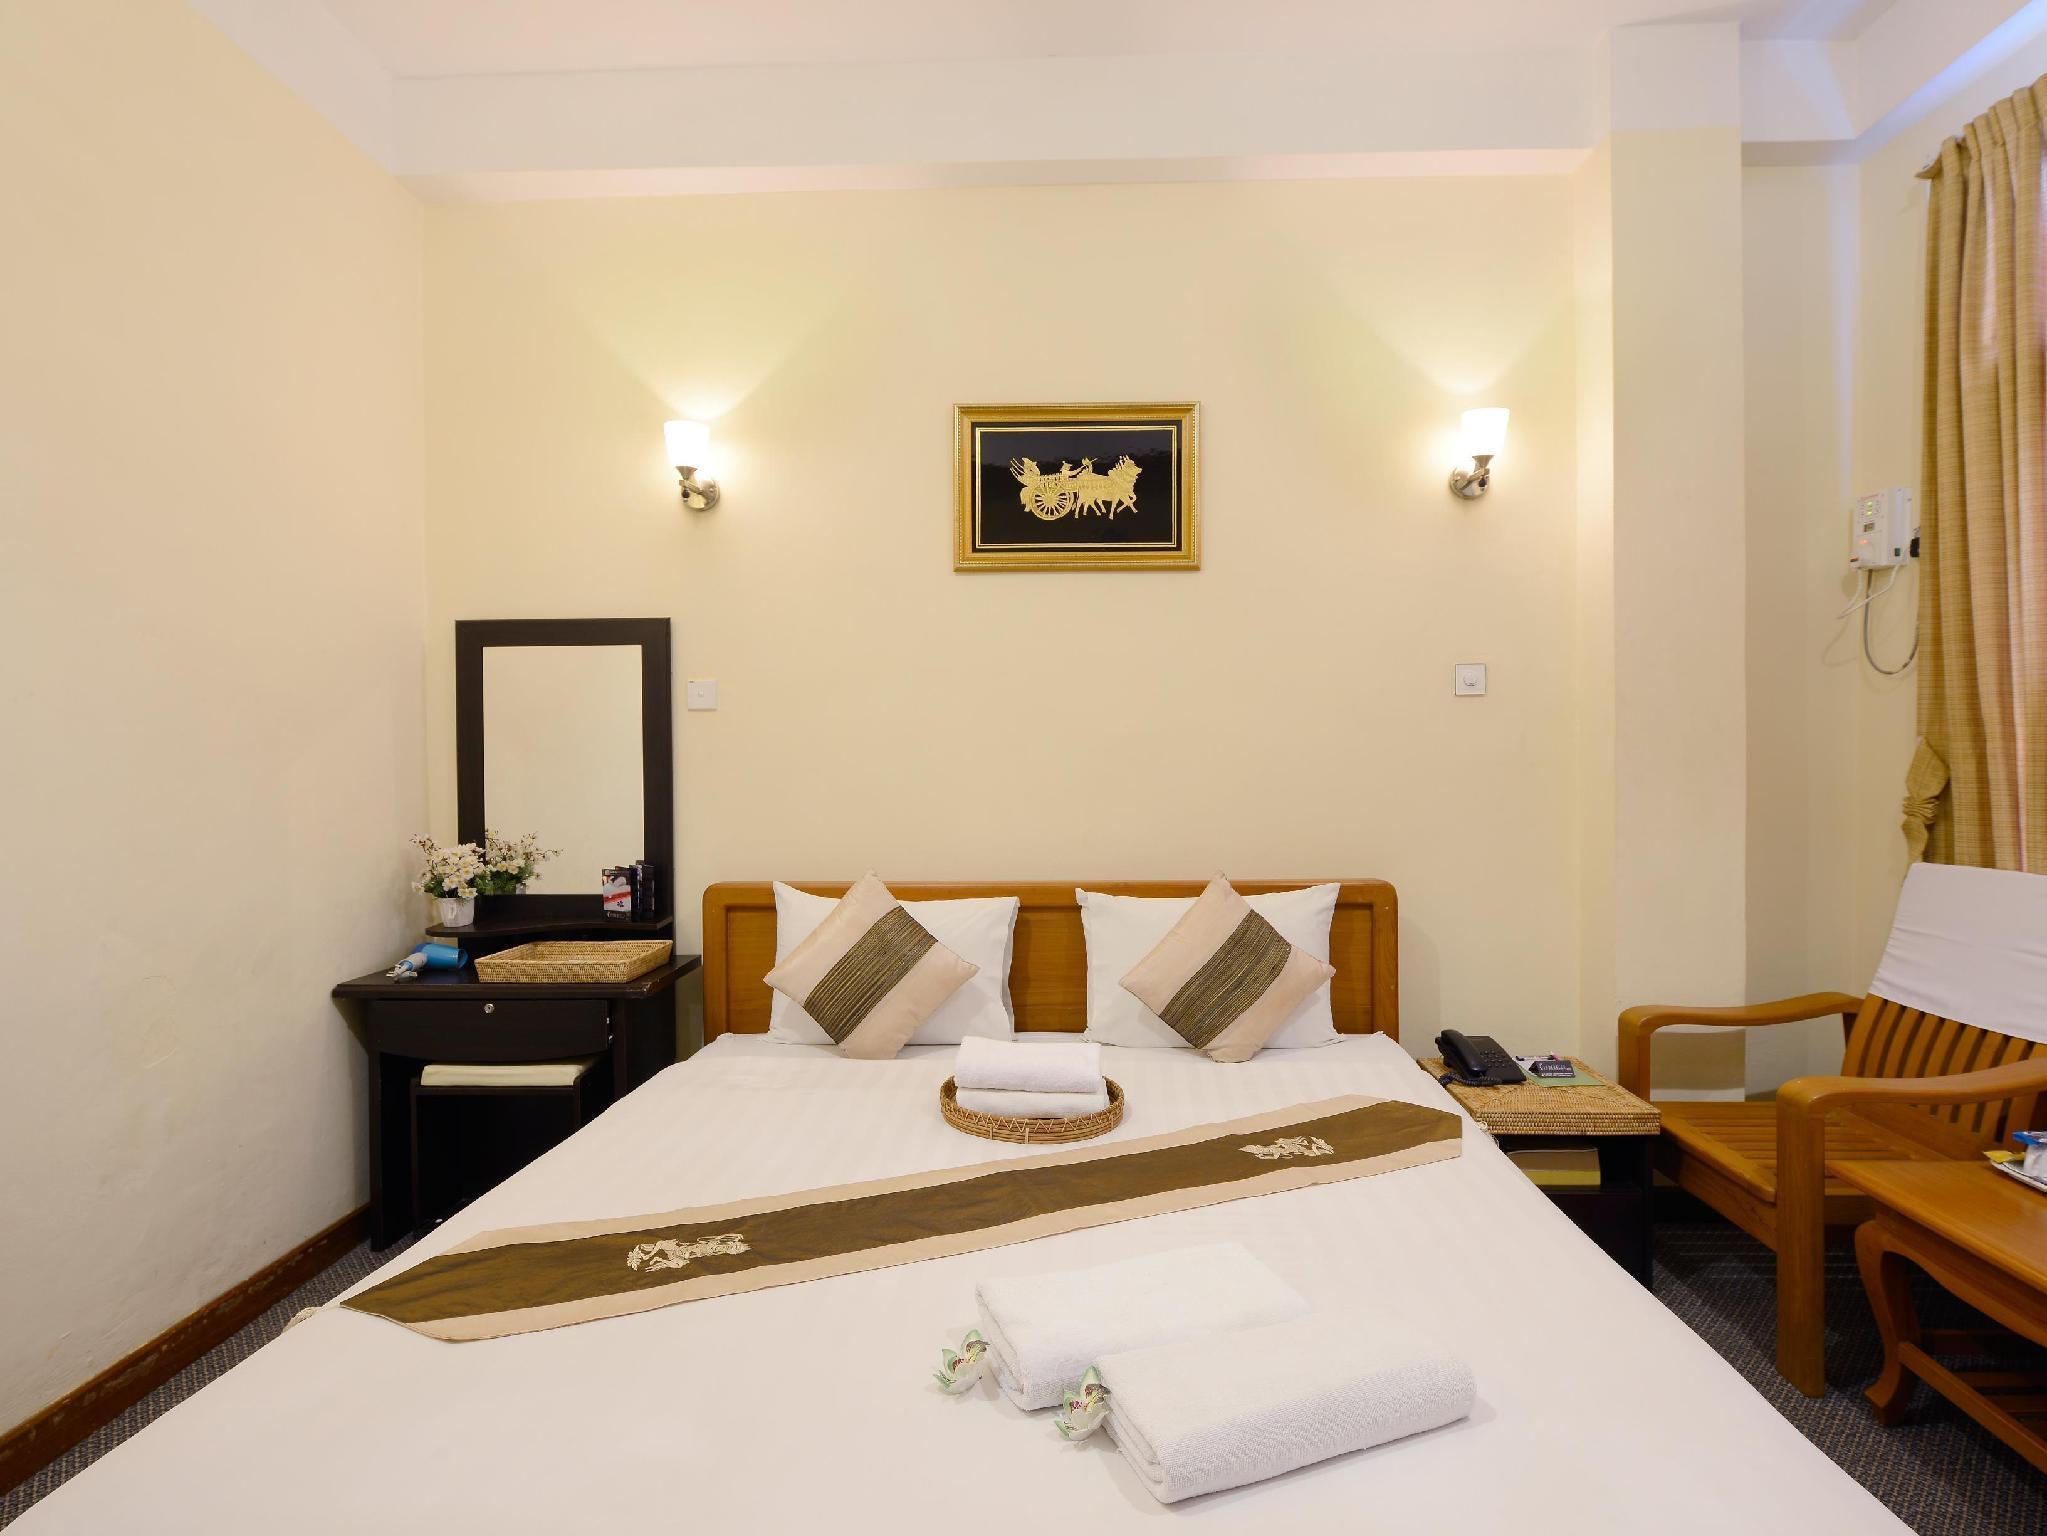 Hotel Queen Jamadevi Best Price On Cinderella Hotel In Mawlamyine Reviews